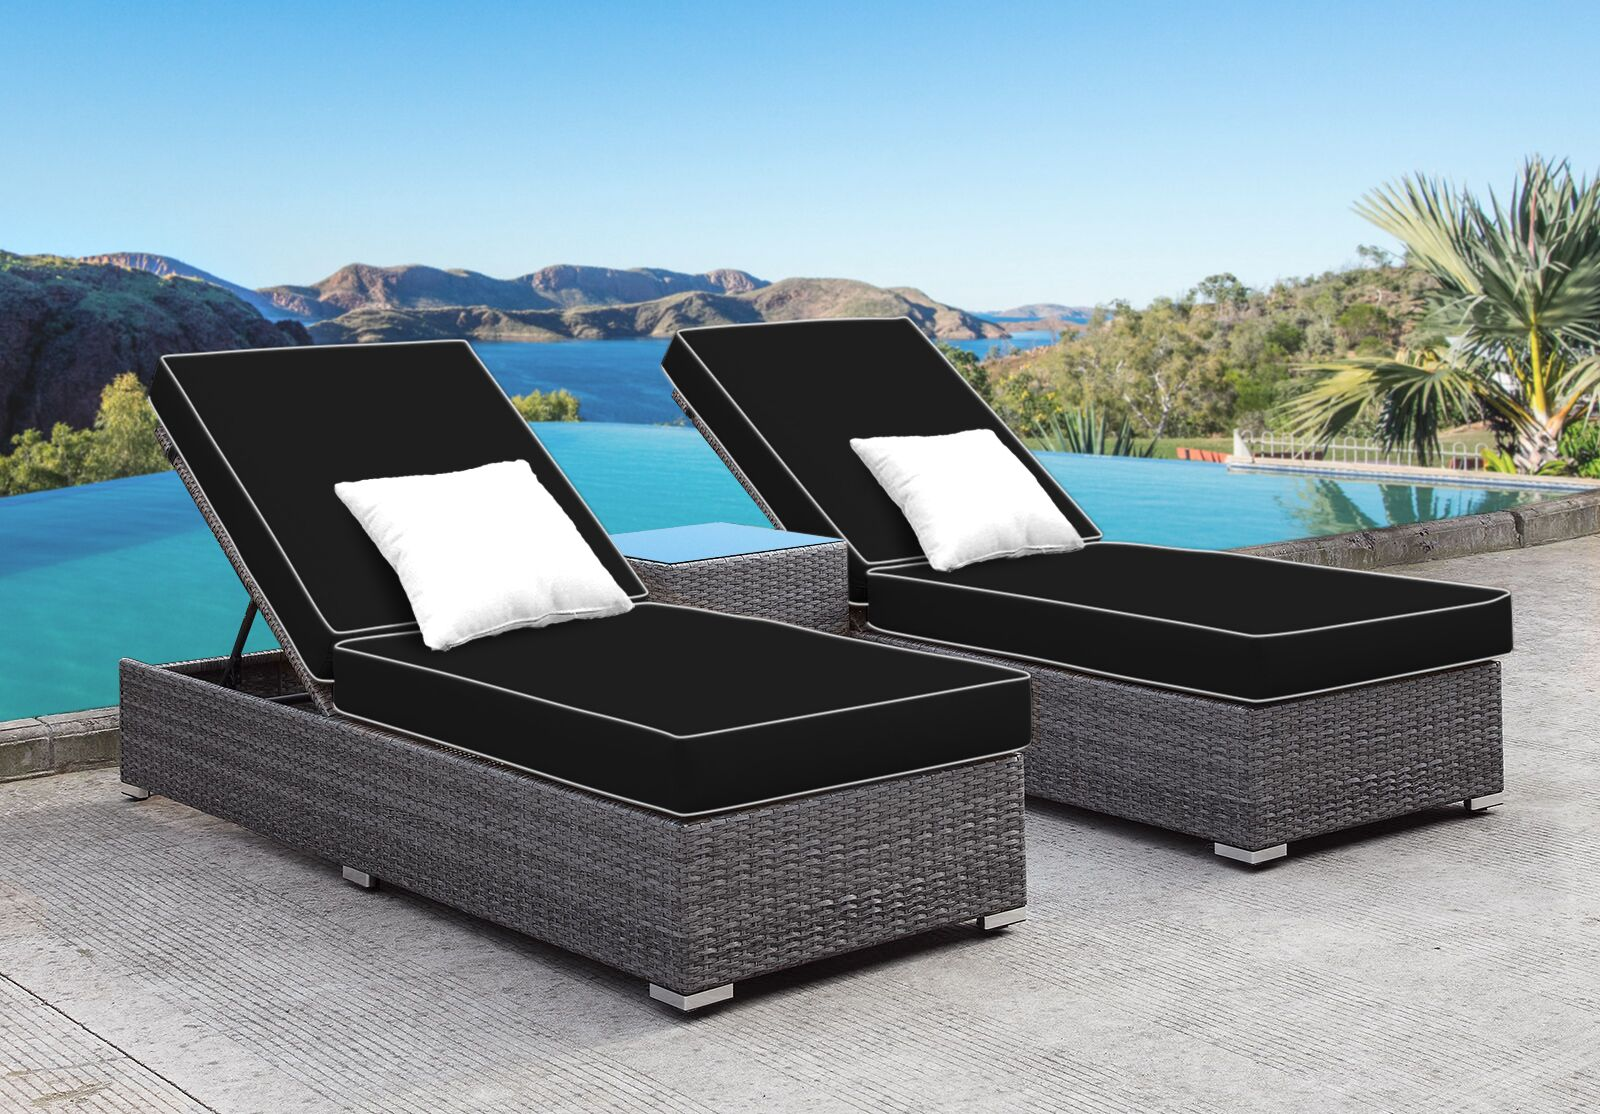 Zavis 3 Piece Reclining Chaise Lounge Set Cushion Color: Black/White